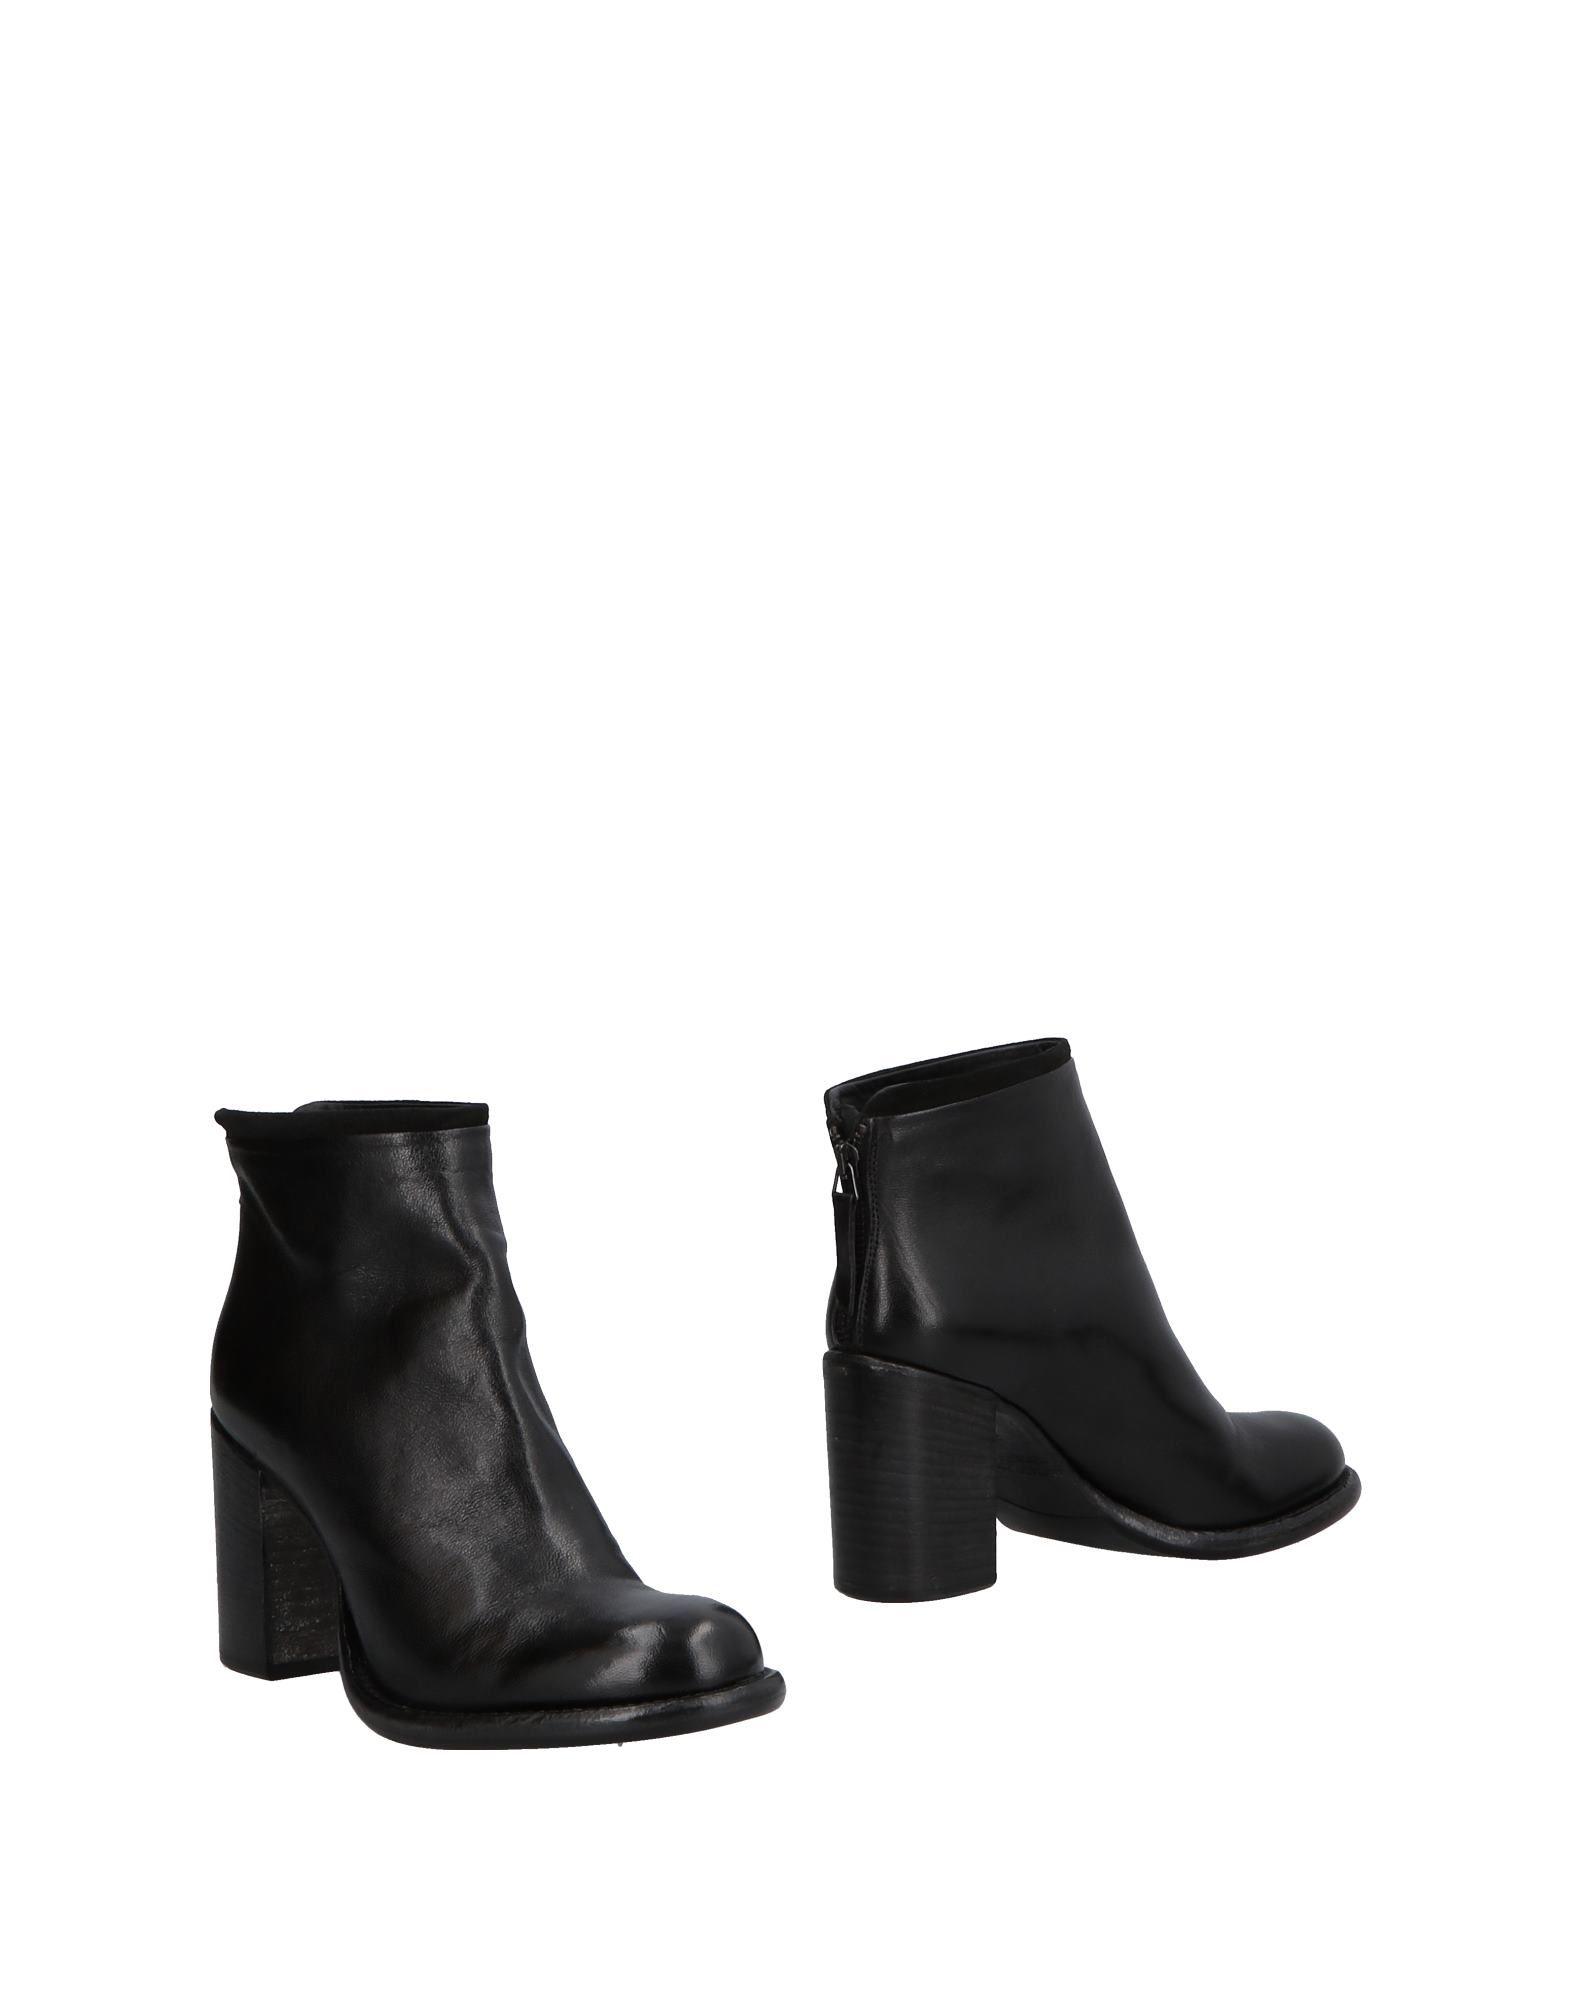 Ernesto Dolani Ankle Boot - Women Ernesto Dolani  Ankle Boots online on  Dolani United Kingdom - 11498936LF 476a09